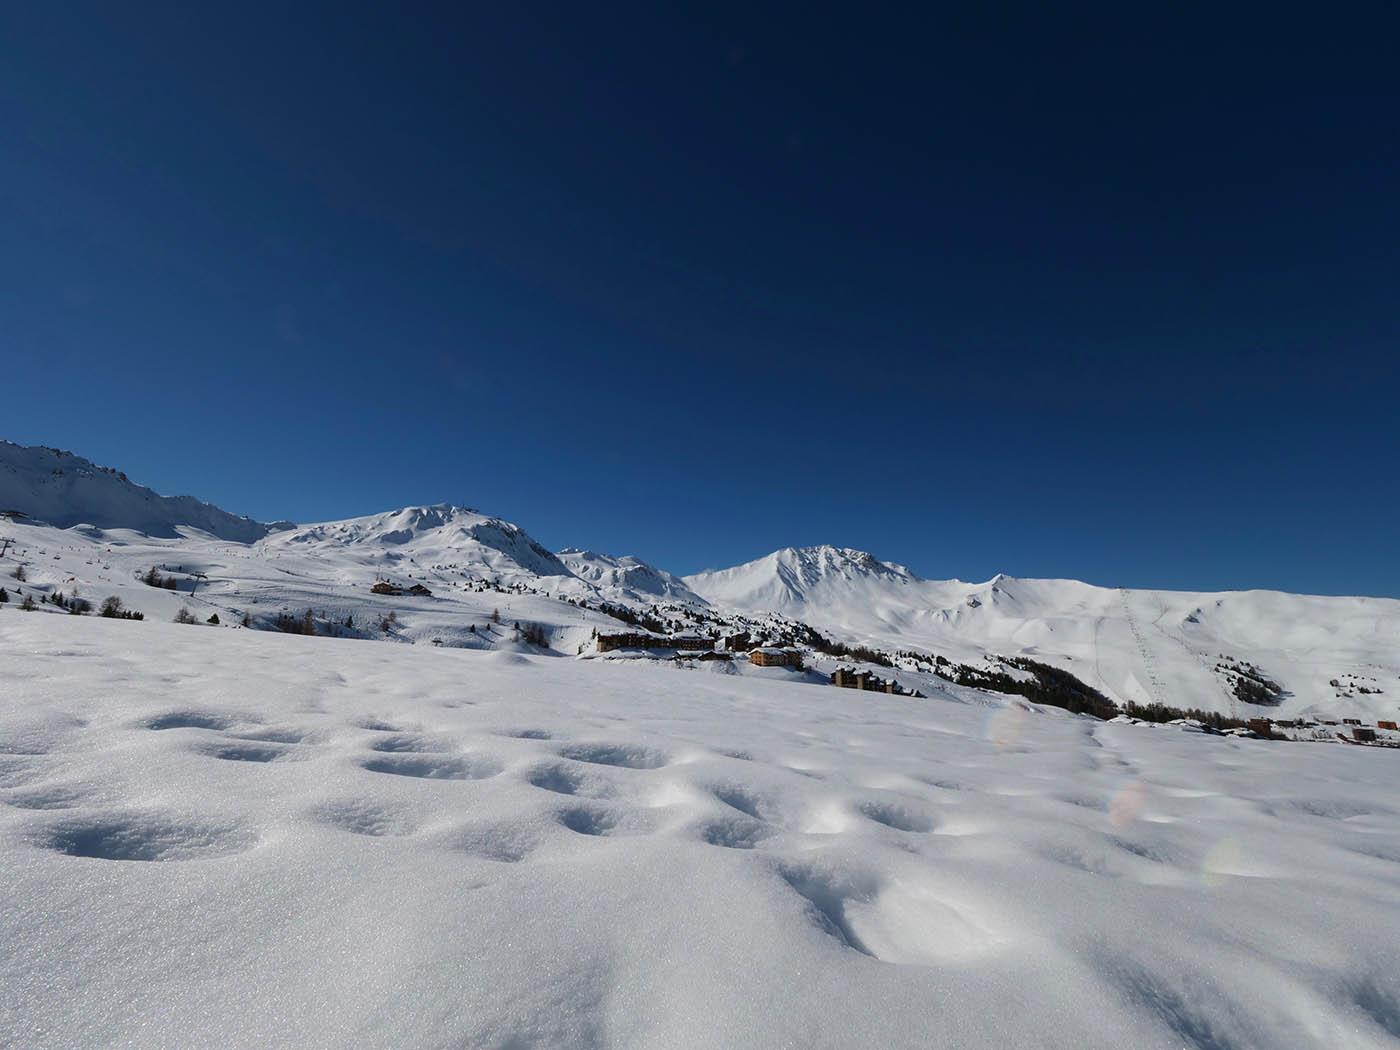 Test en montagne du Olympus 7-14 mm f2.8 Pro